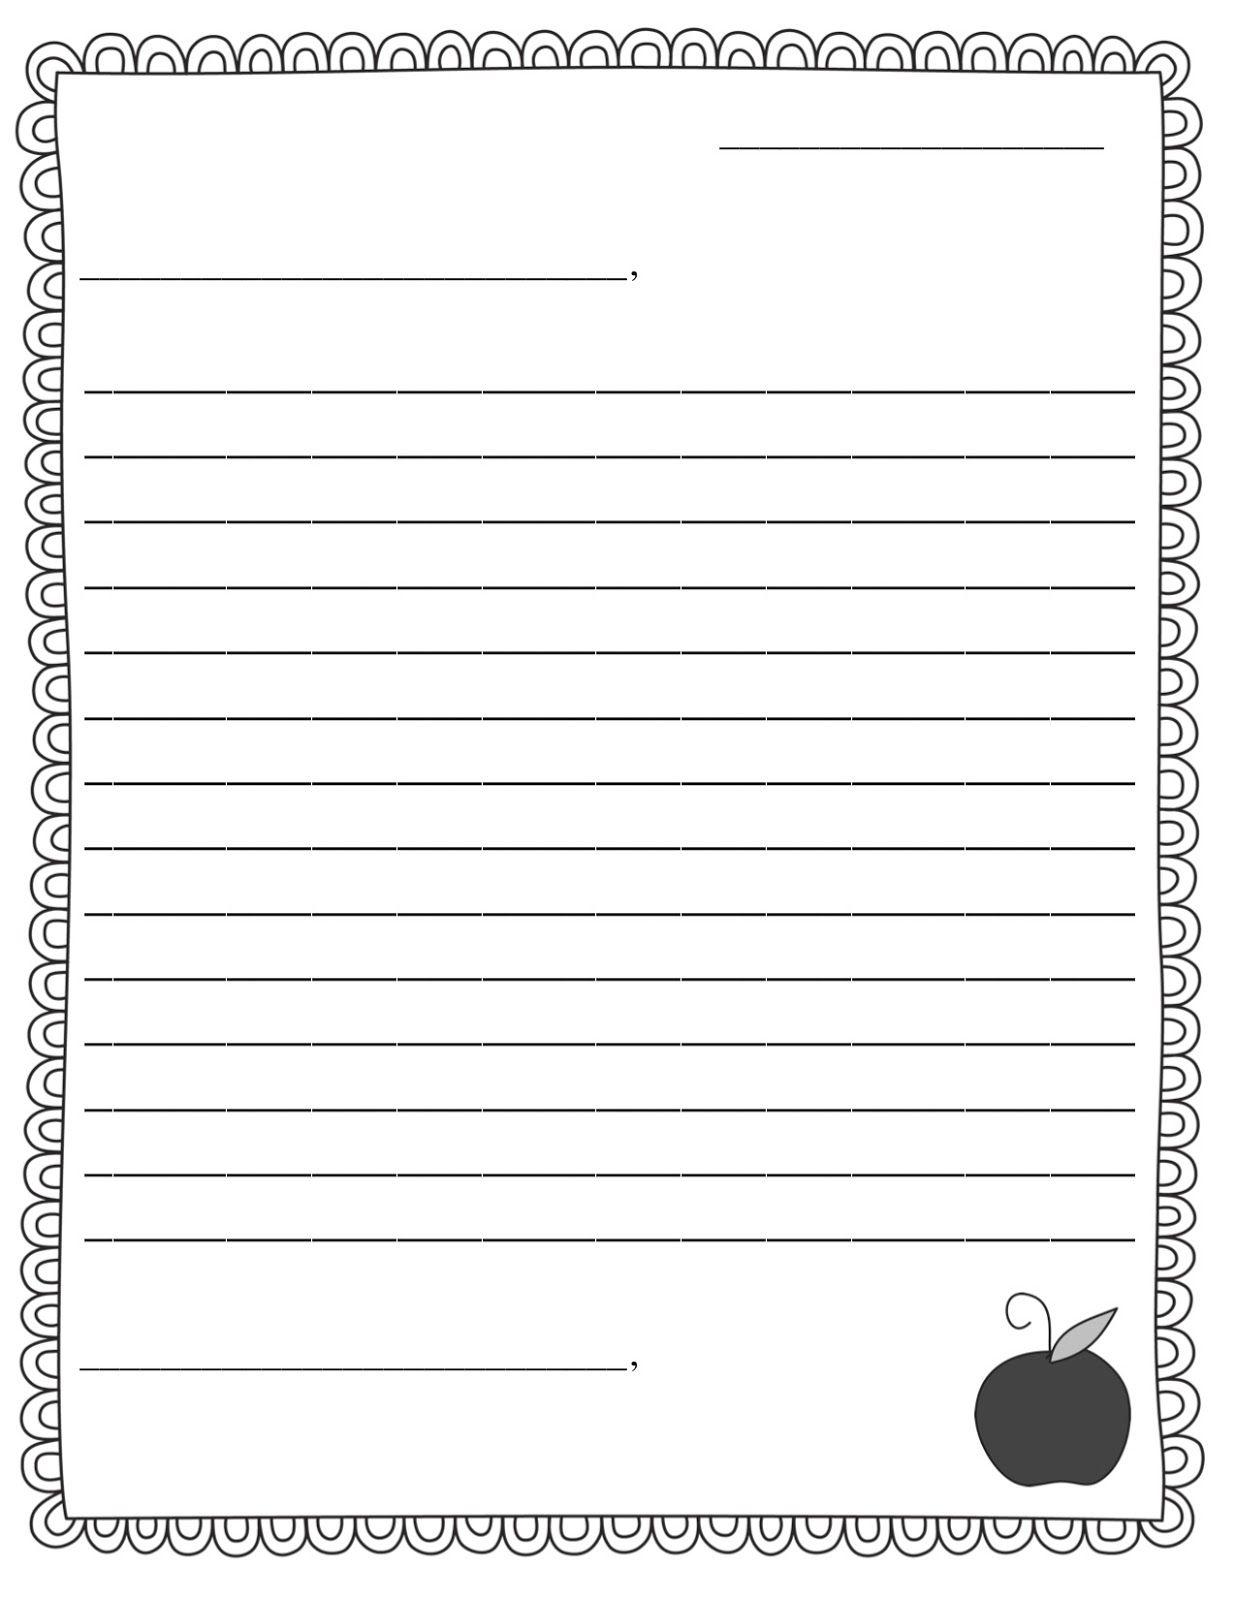 Pen Pal News Friendly Letter Freebie Letter Writing Template